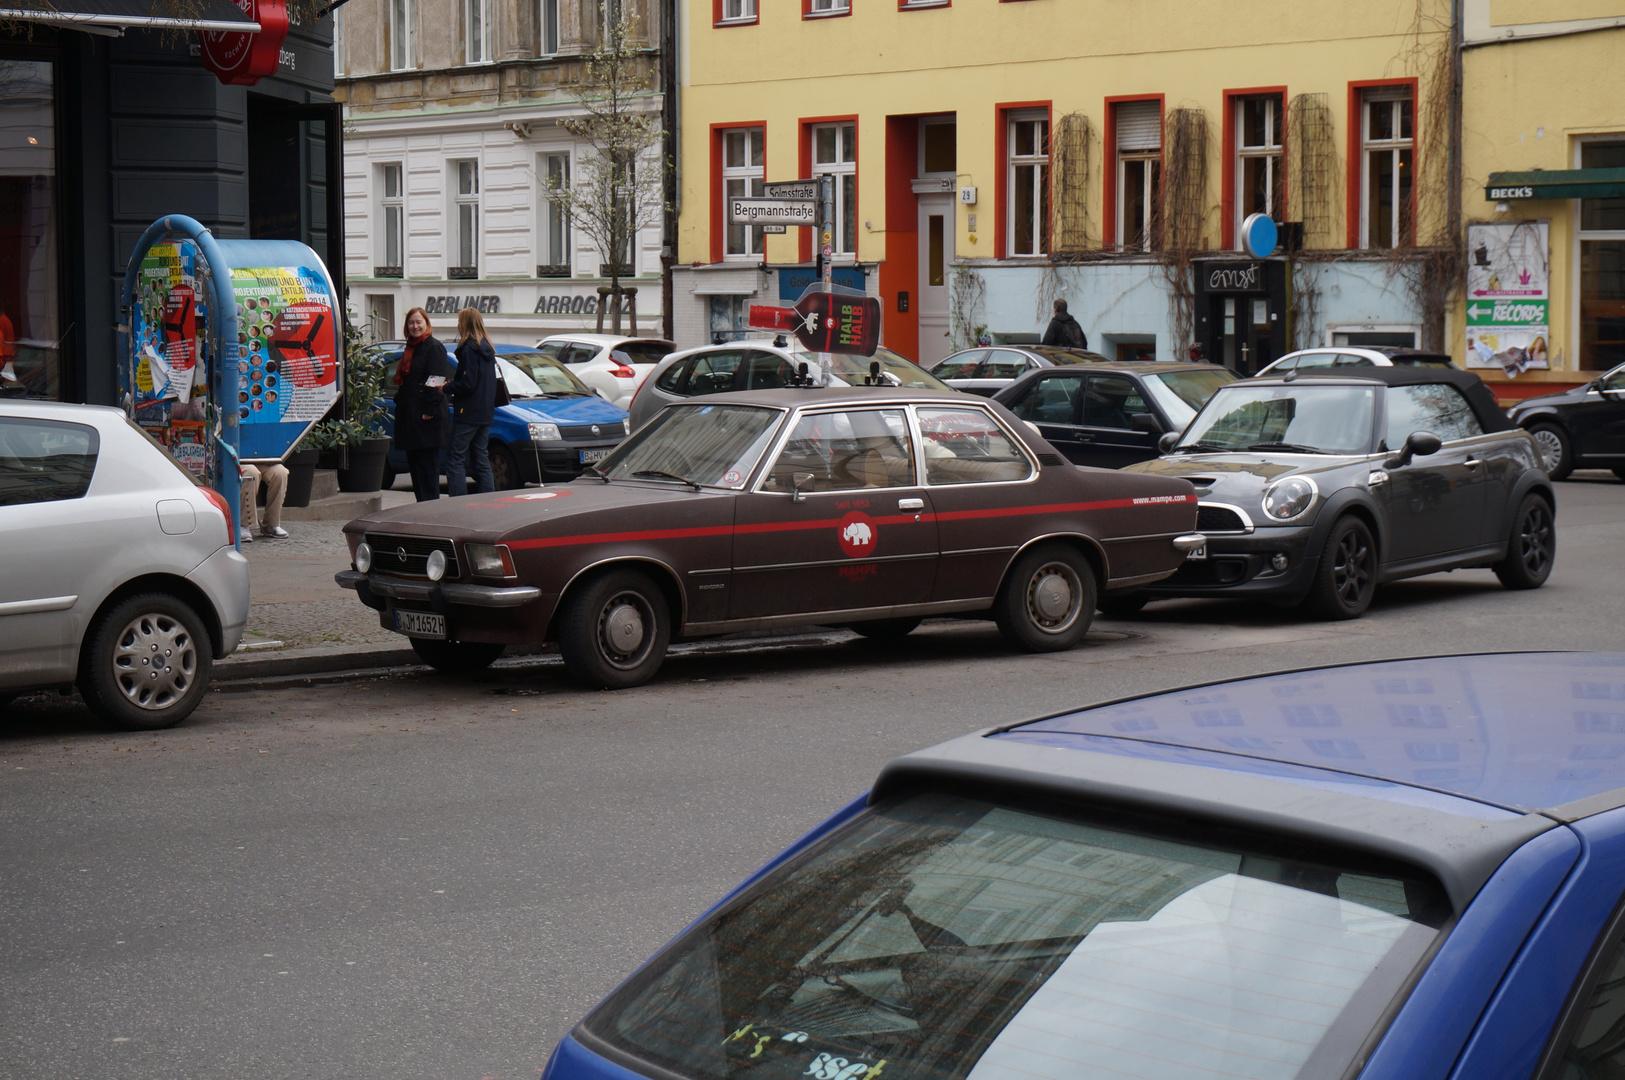 Opel Rekord Zweitürer gepaart mit Mini und Berliner Arroganz, Streetart